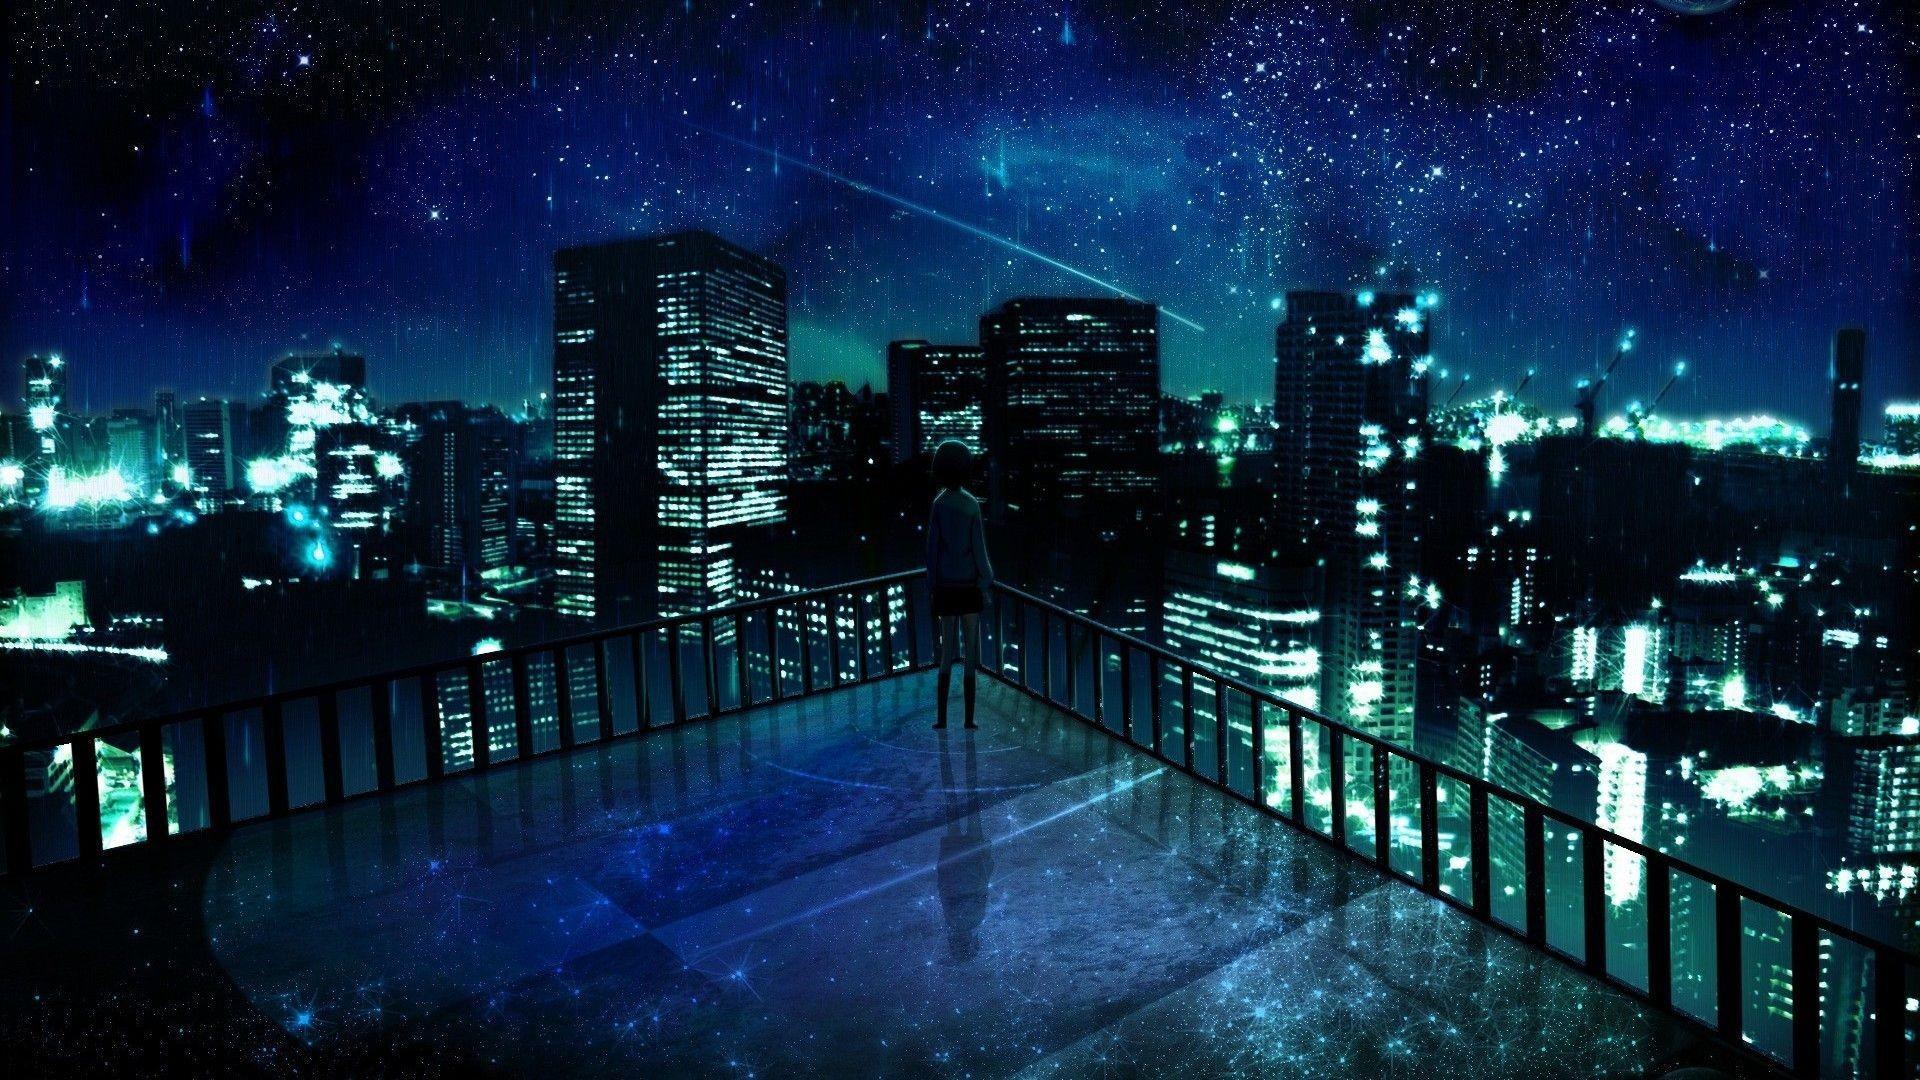 4. anime wallpapers4